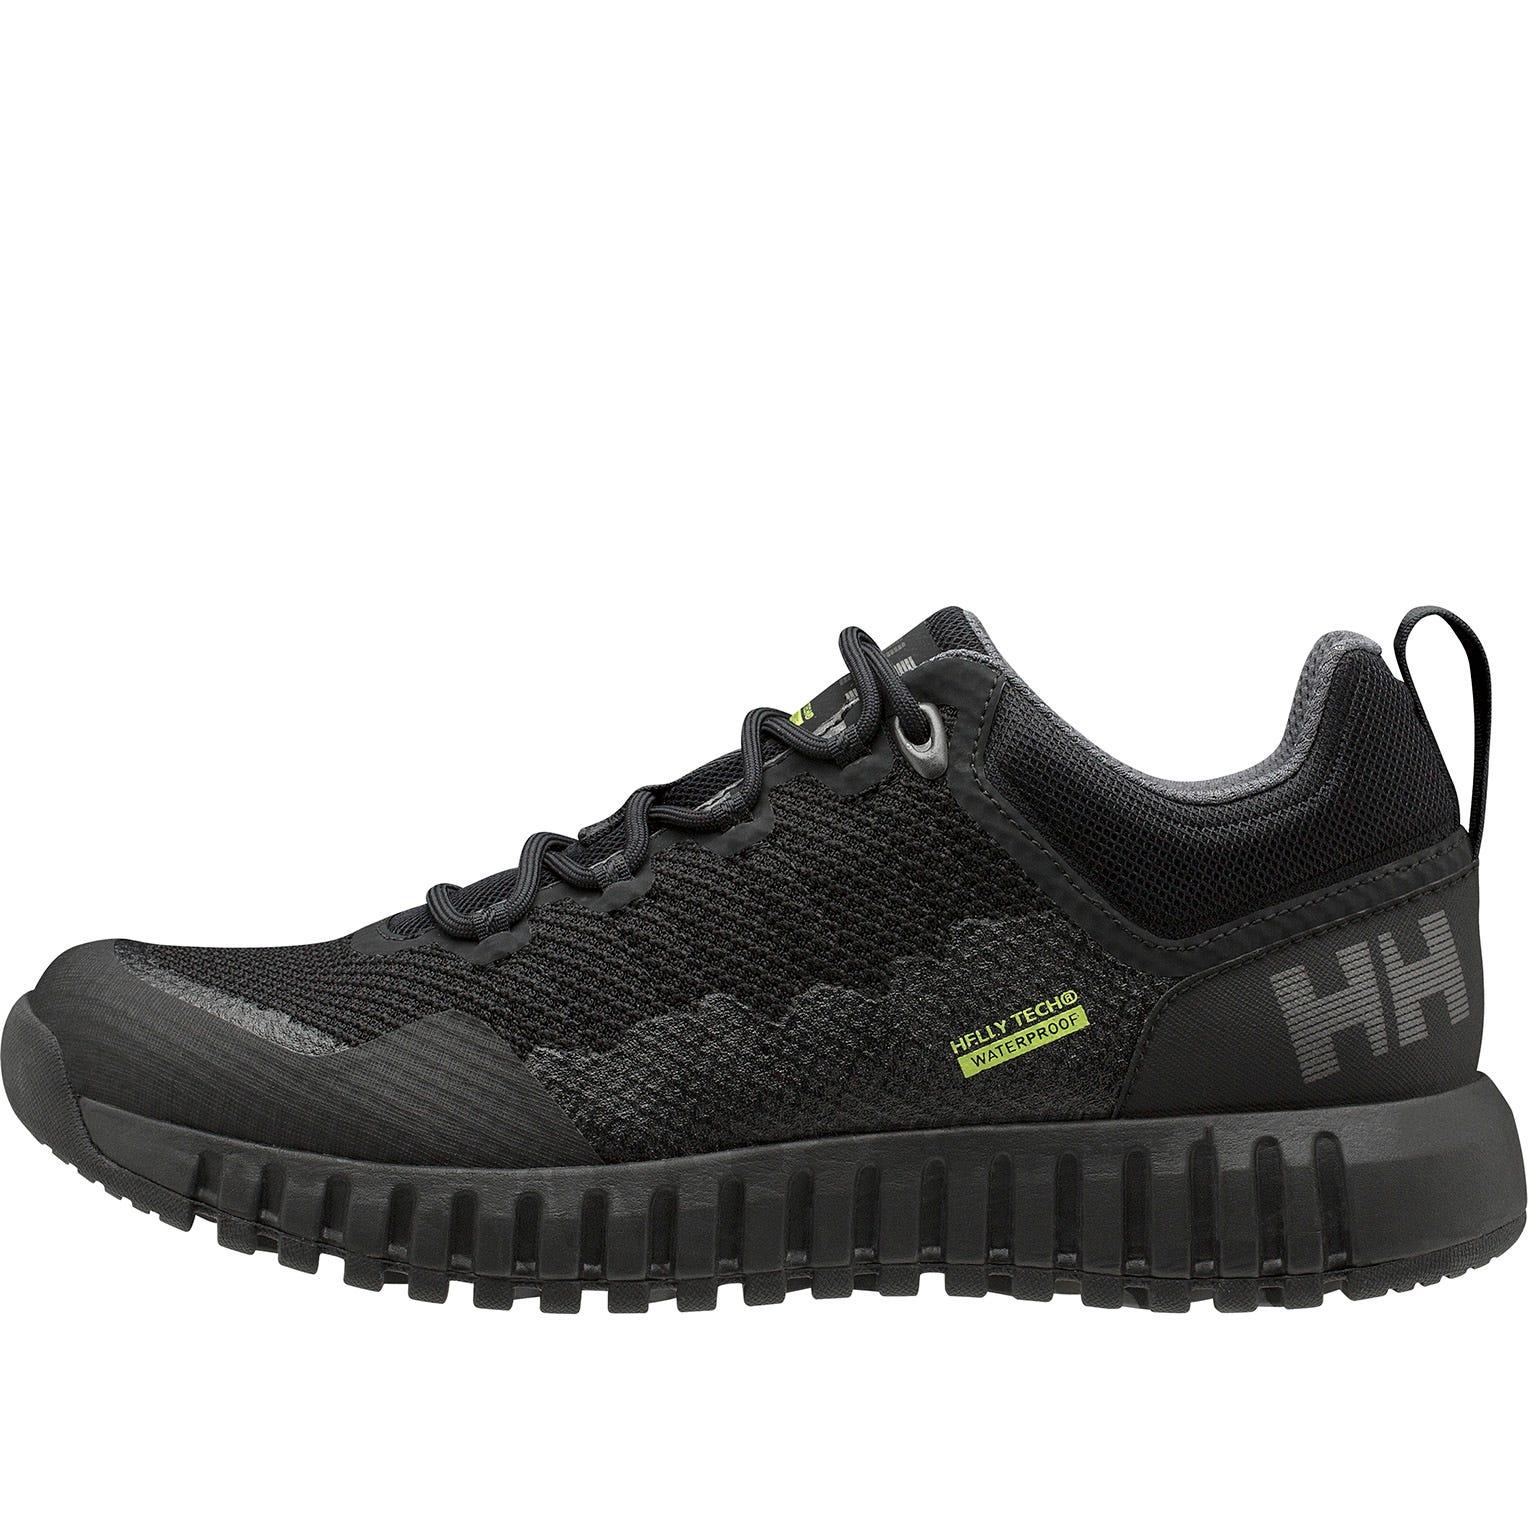 Helly Hansen Vanir Hegira Ht Mens Hiking Boot Black 44/10